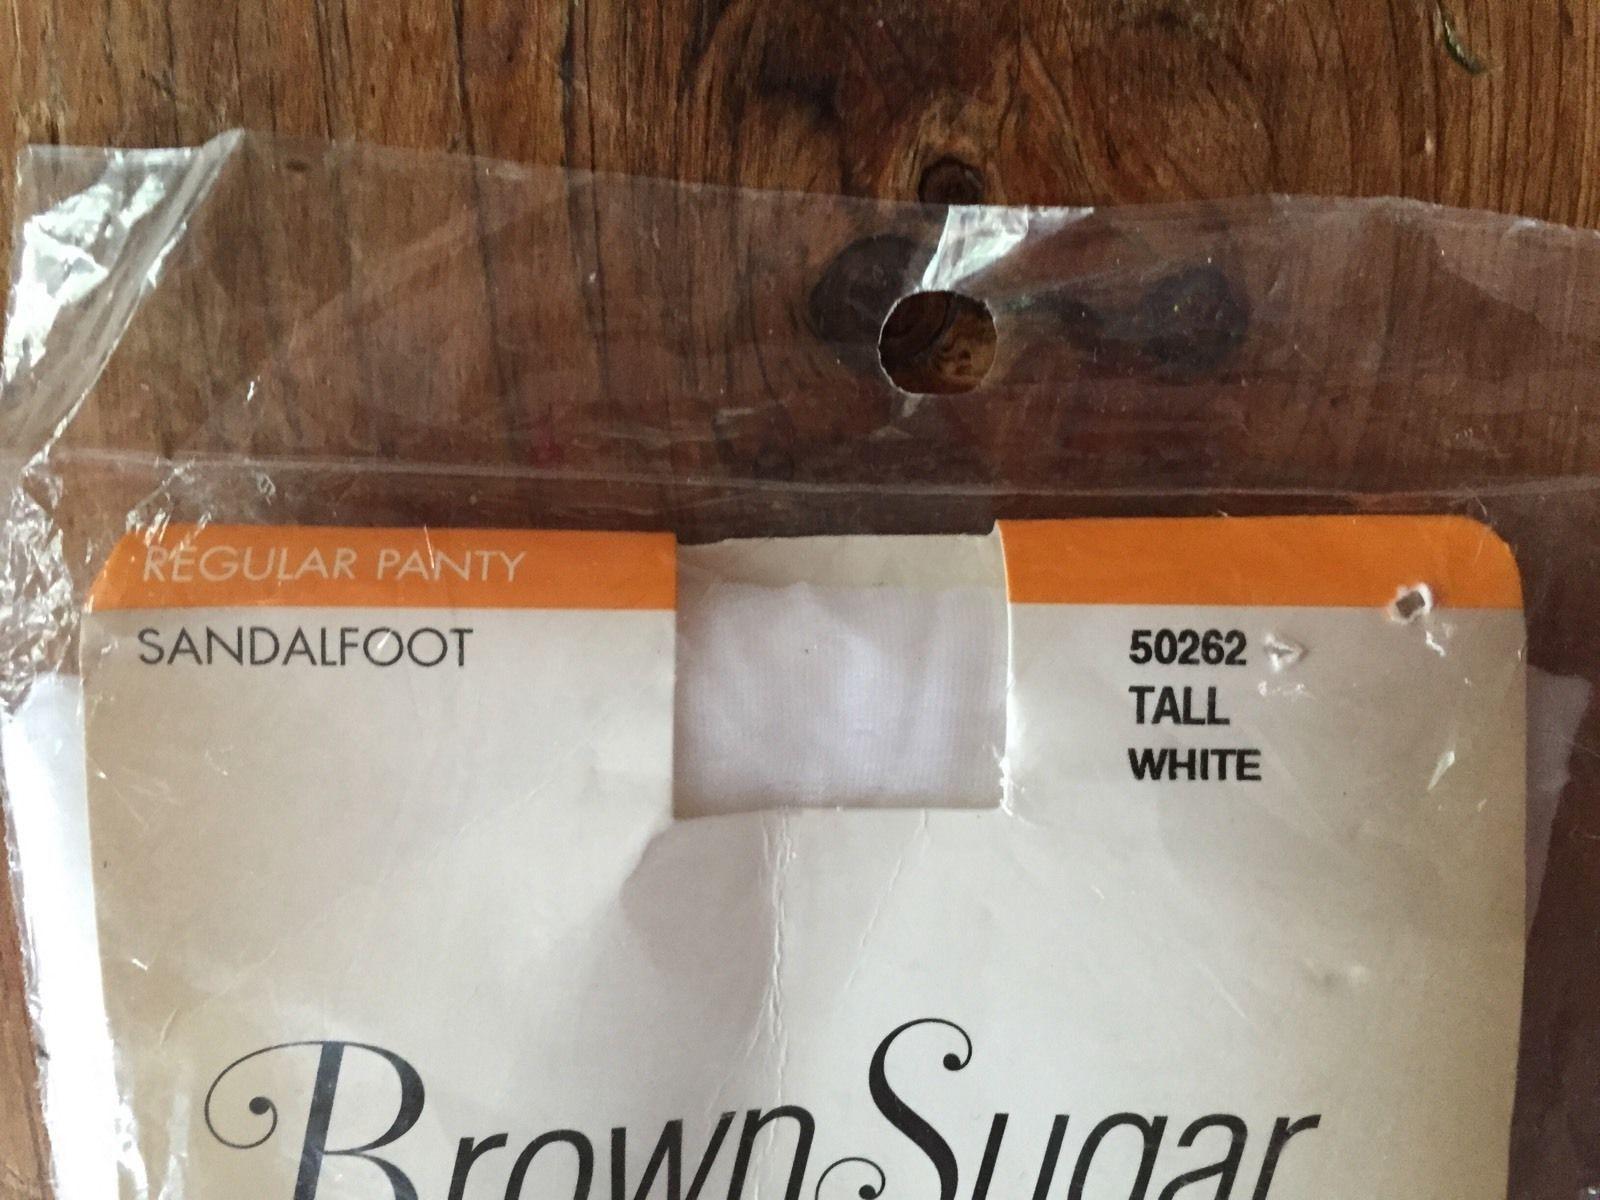 a93e7ecfc2b45 Leggs Brown Sugar Ultra Ultra Sheer Pantyhose Control Top White Tall